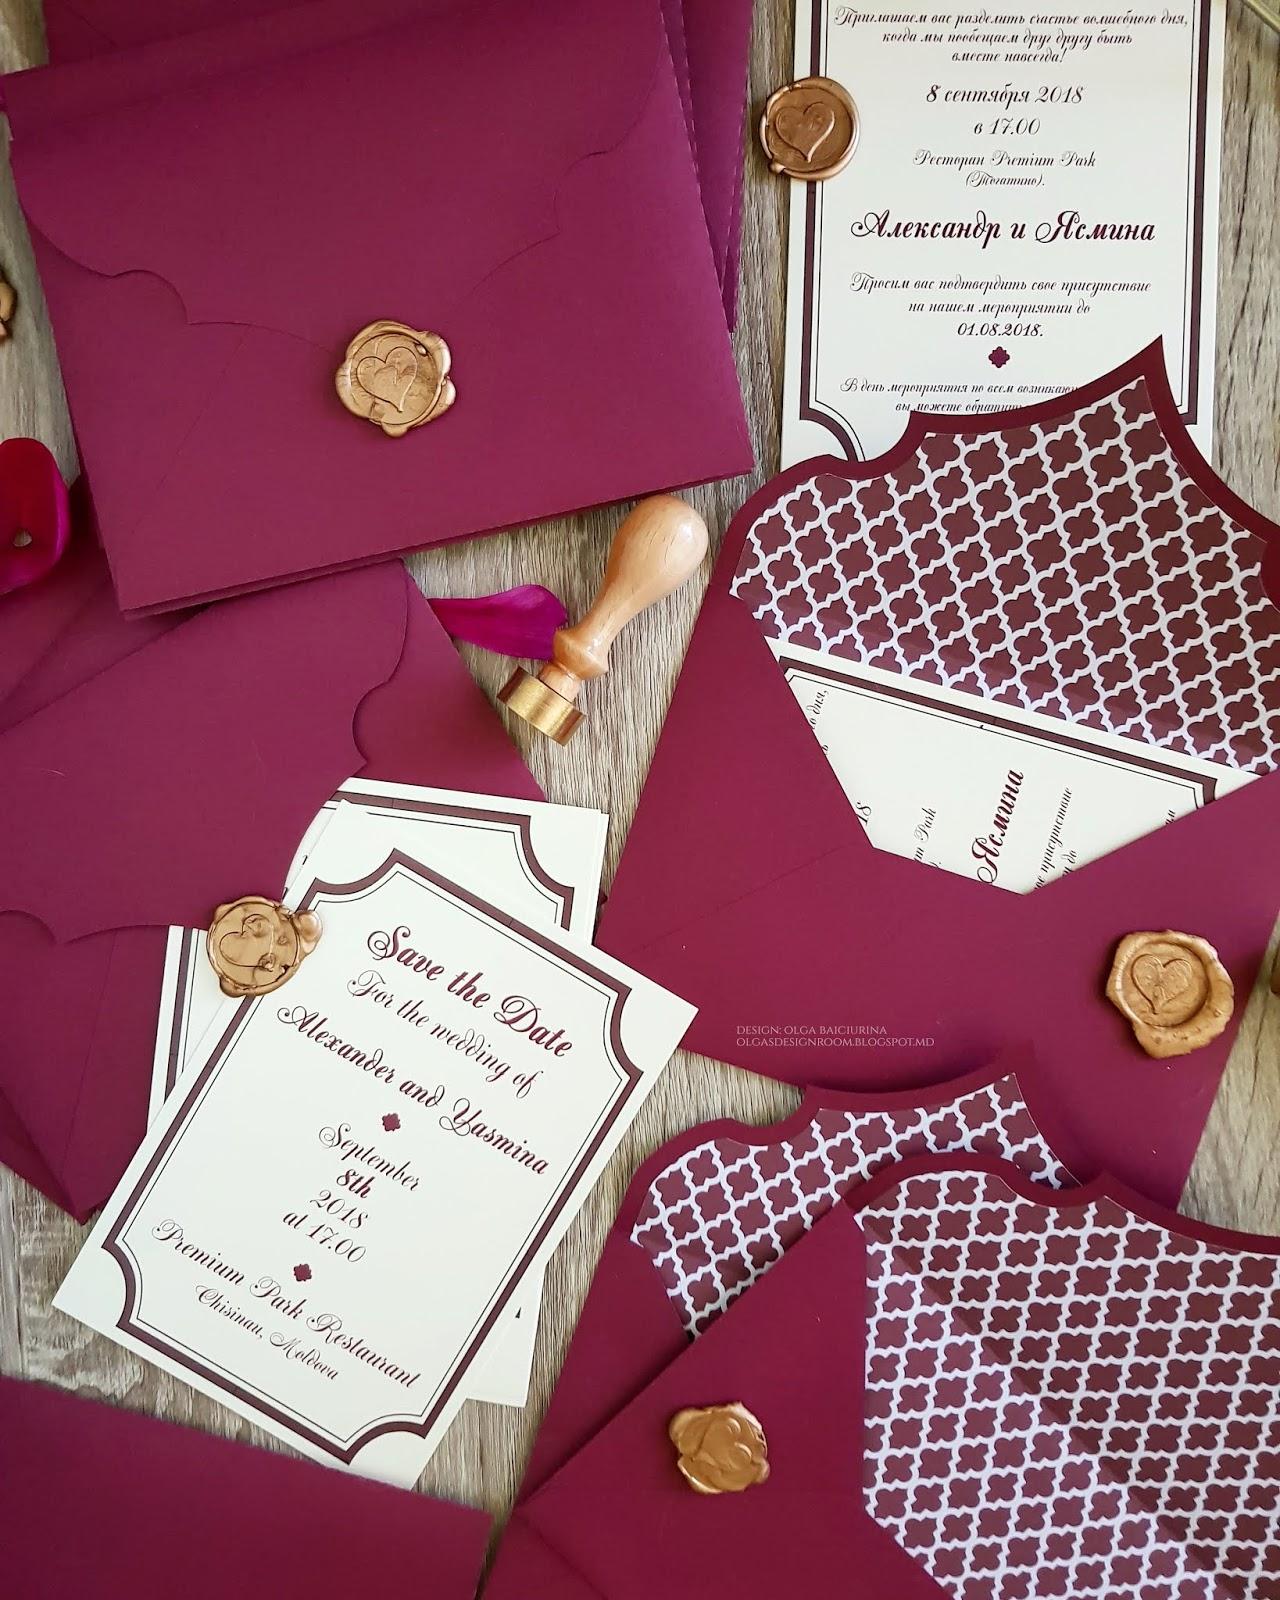 Middle Eastern Wedding Invitations